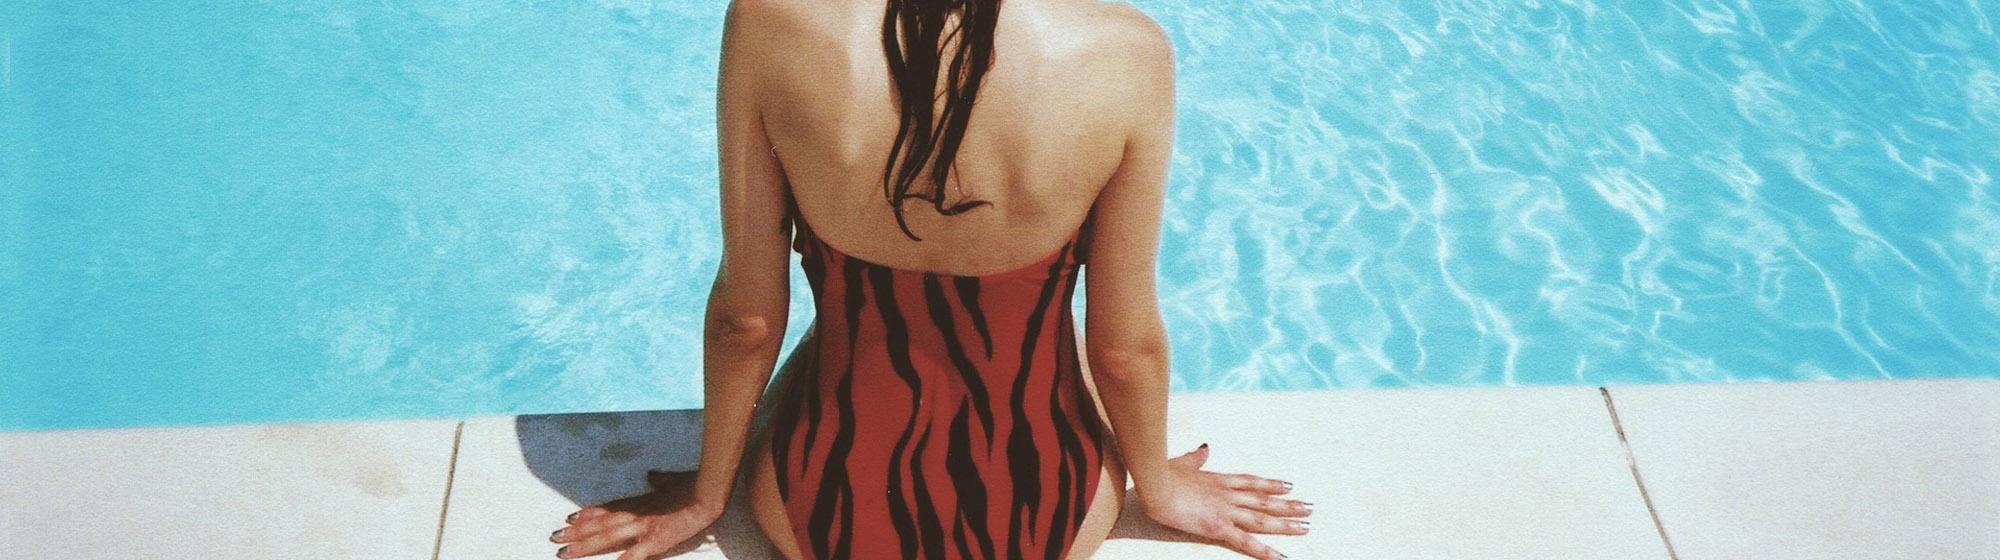 adult-learn-to-swim-perth_australia